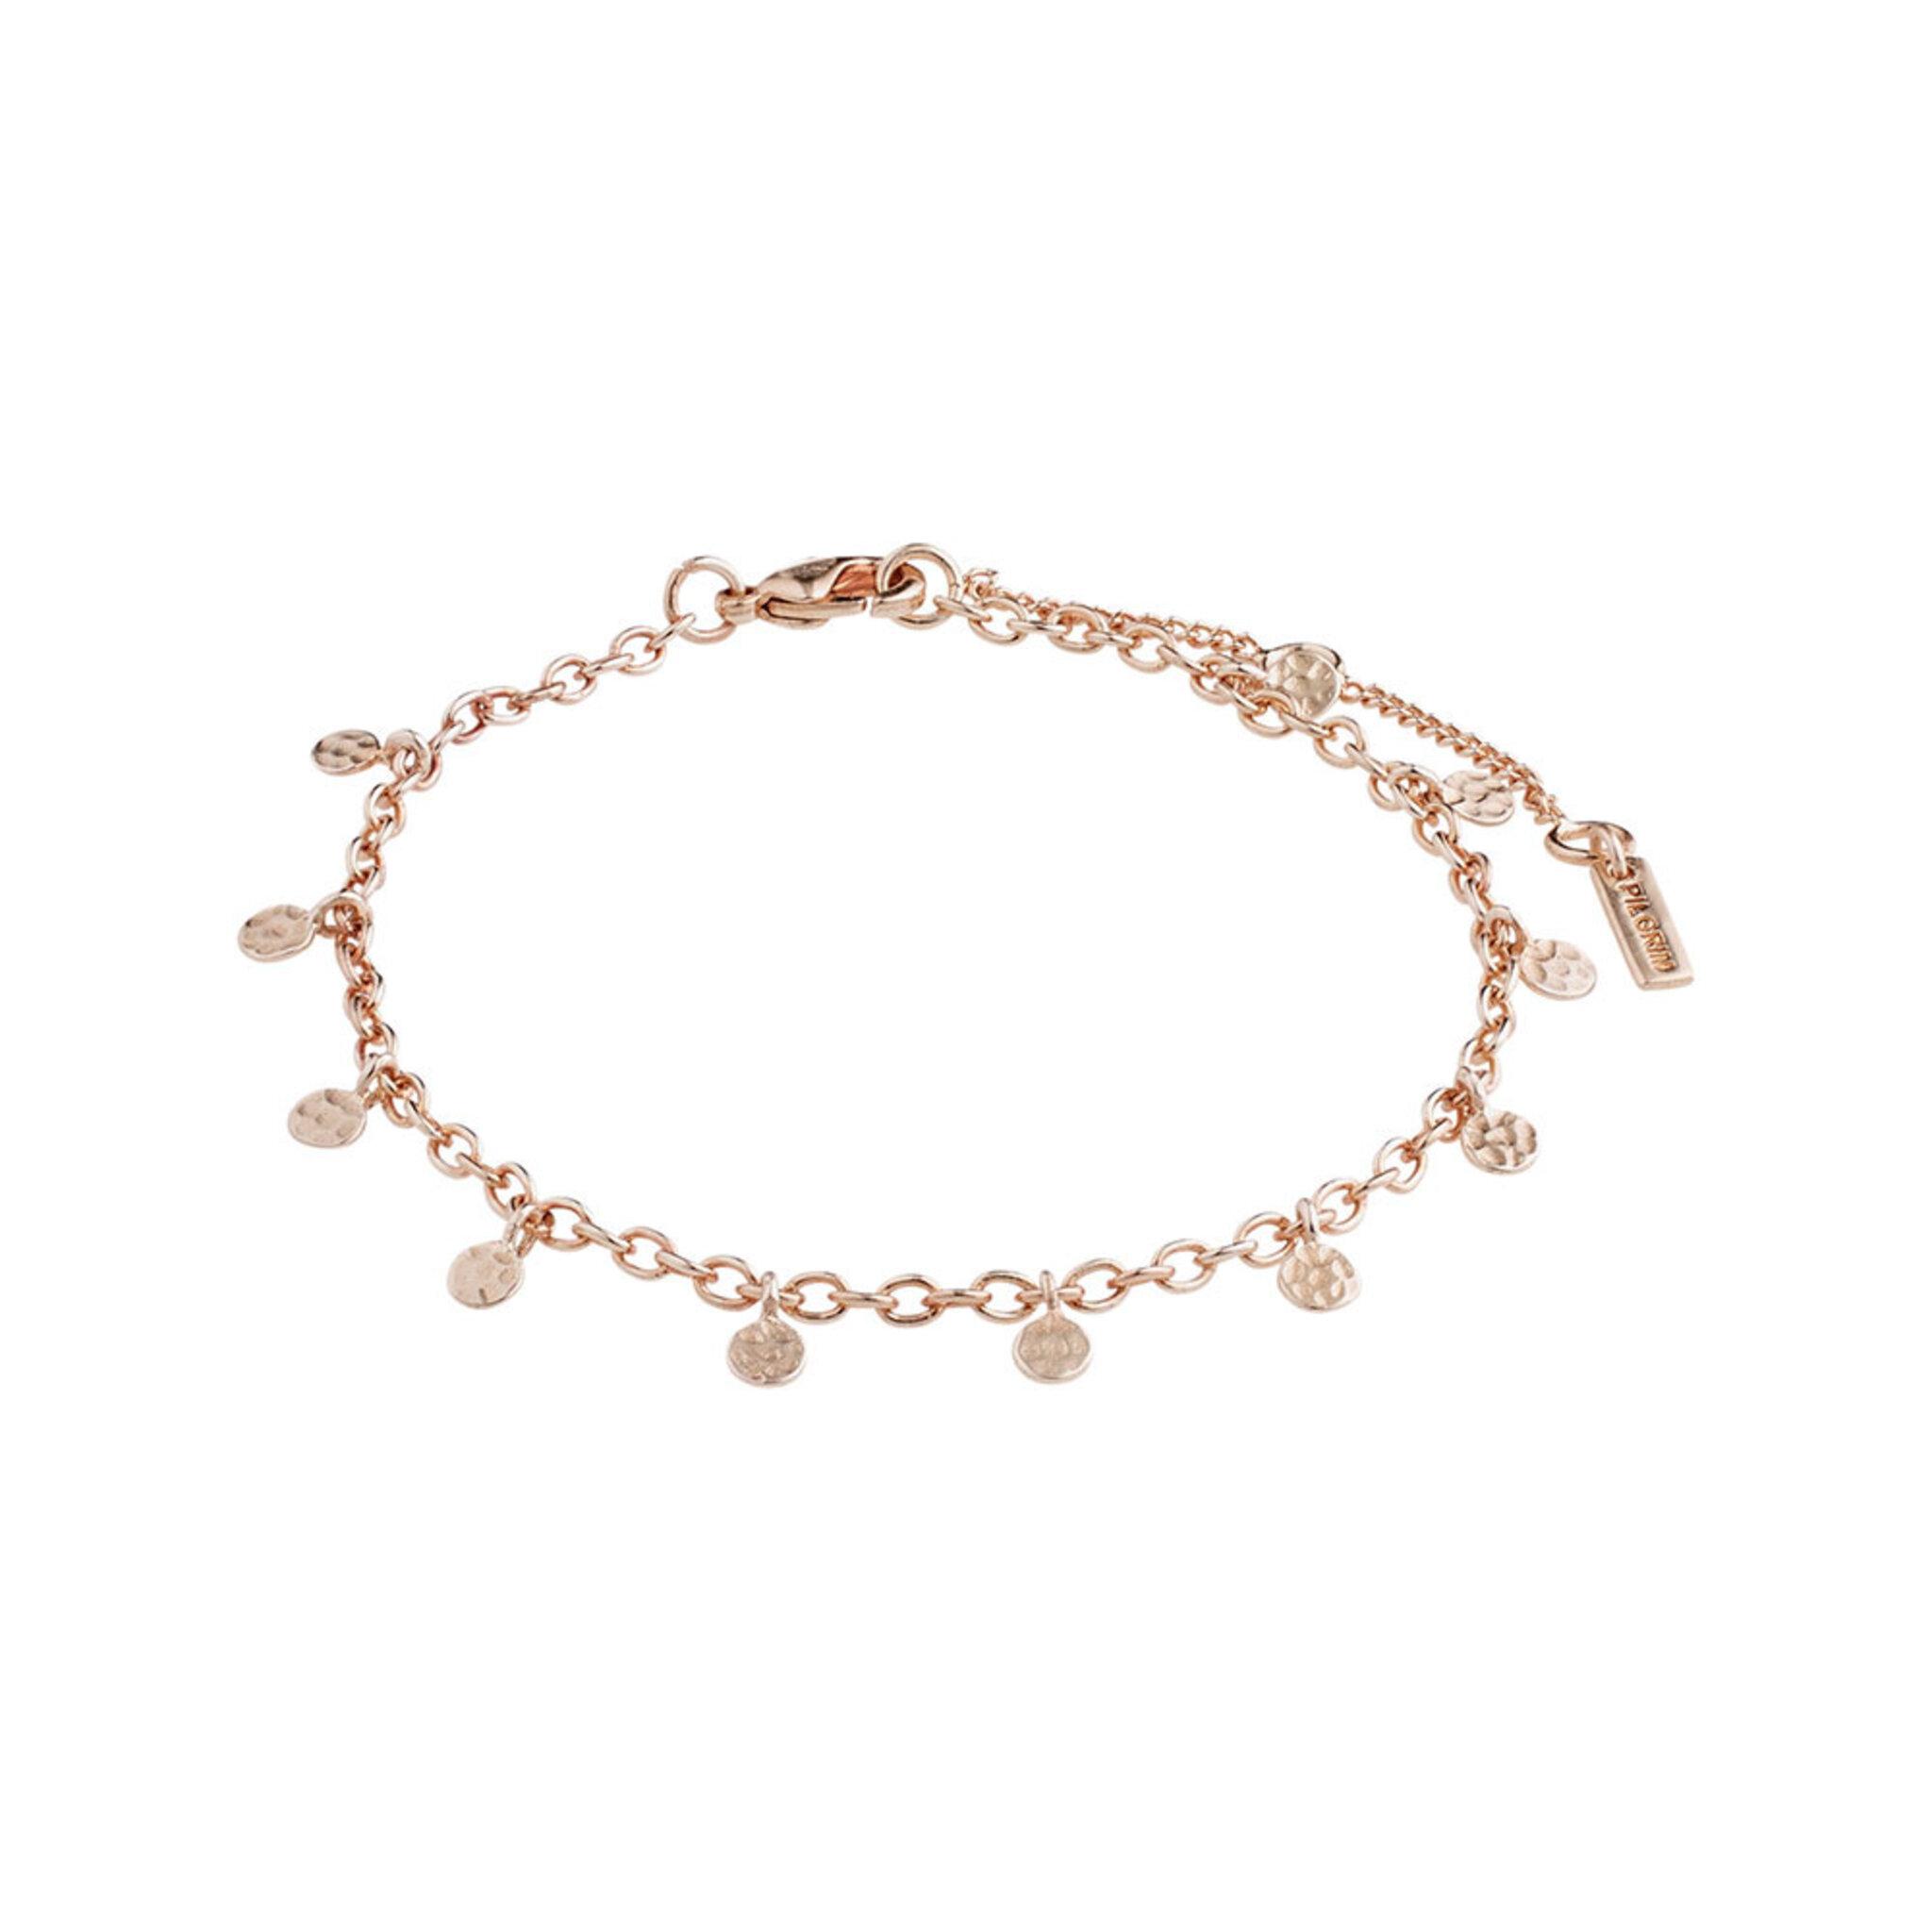 Bracelet : Panna : Rose Gold Plated, ONE SIZE